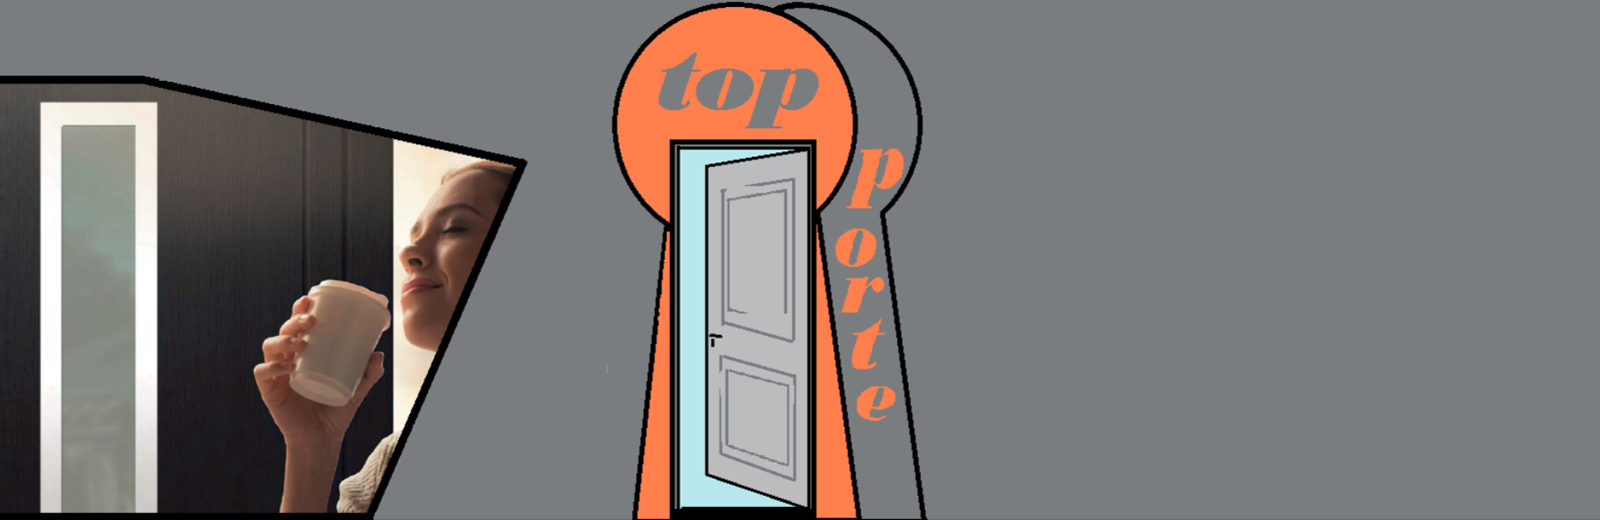 Accueil-Top-Porte